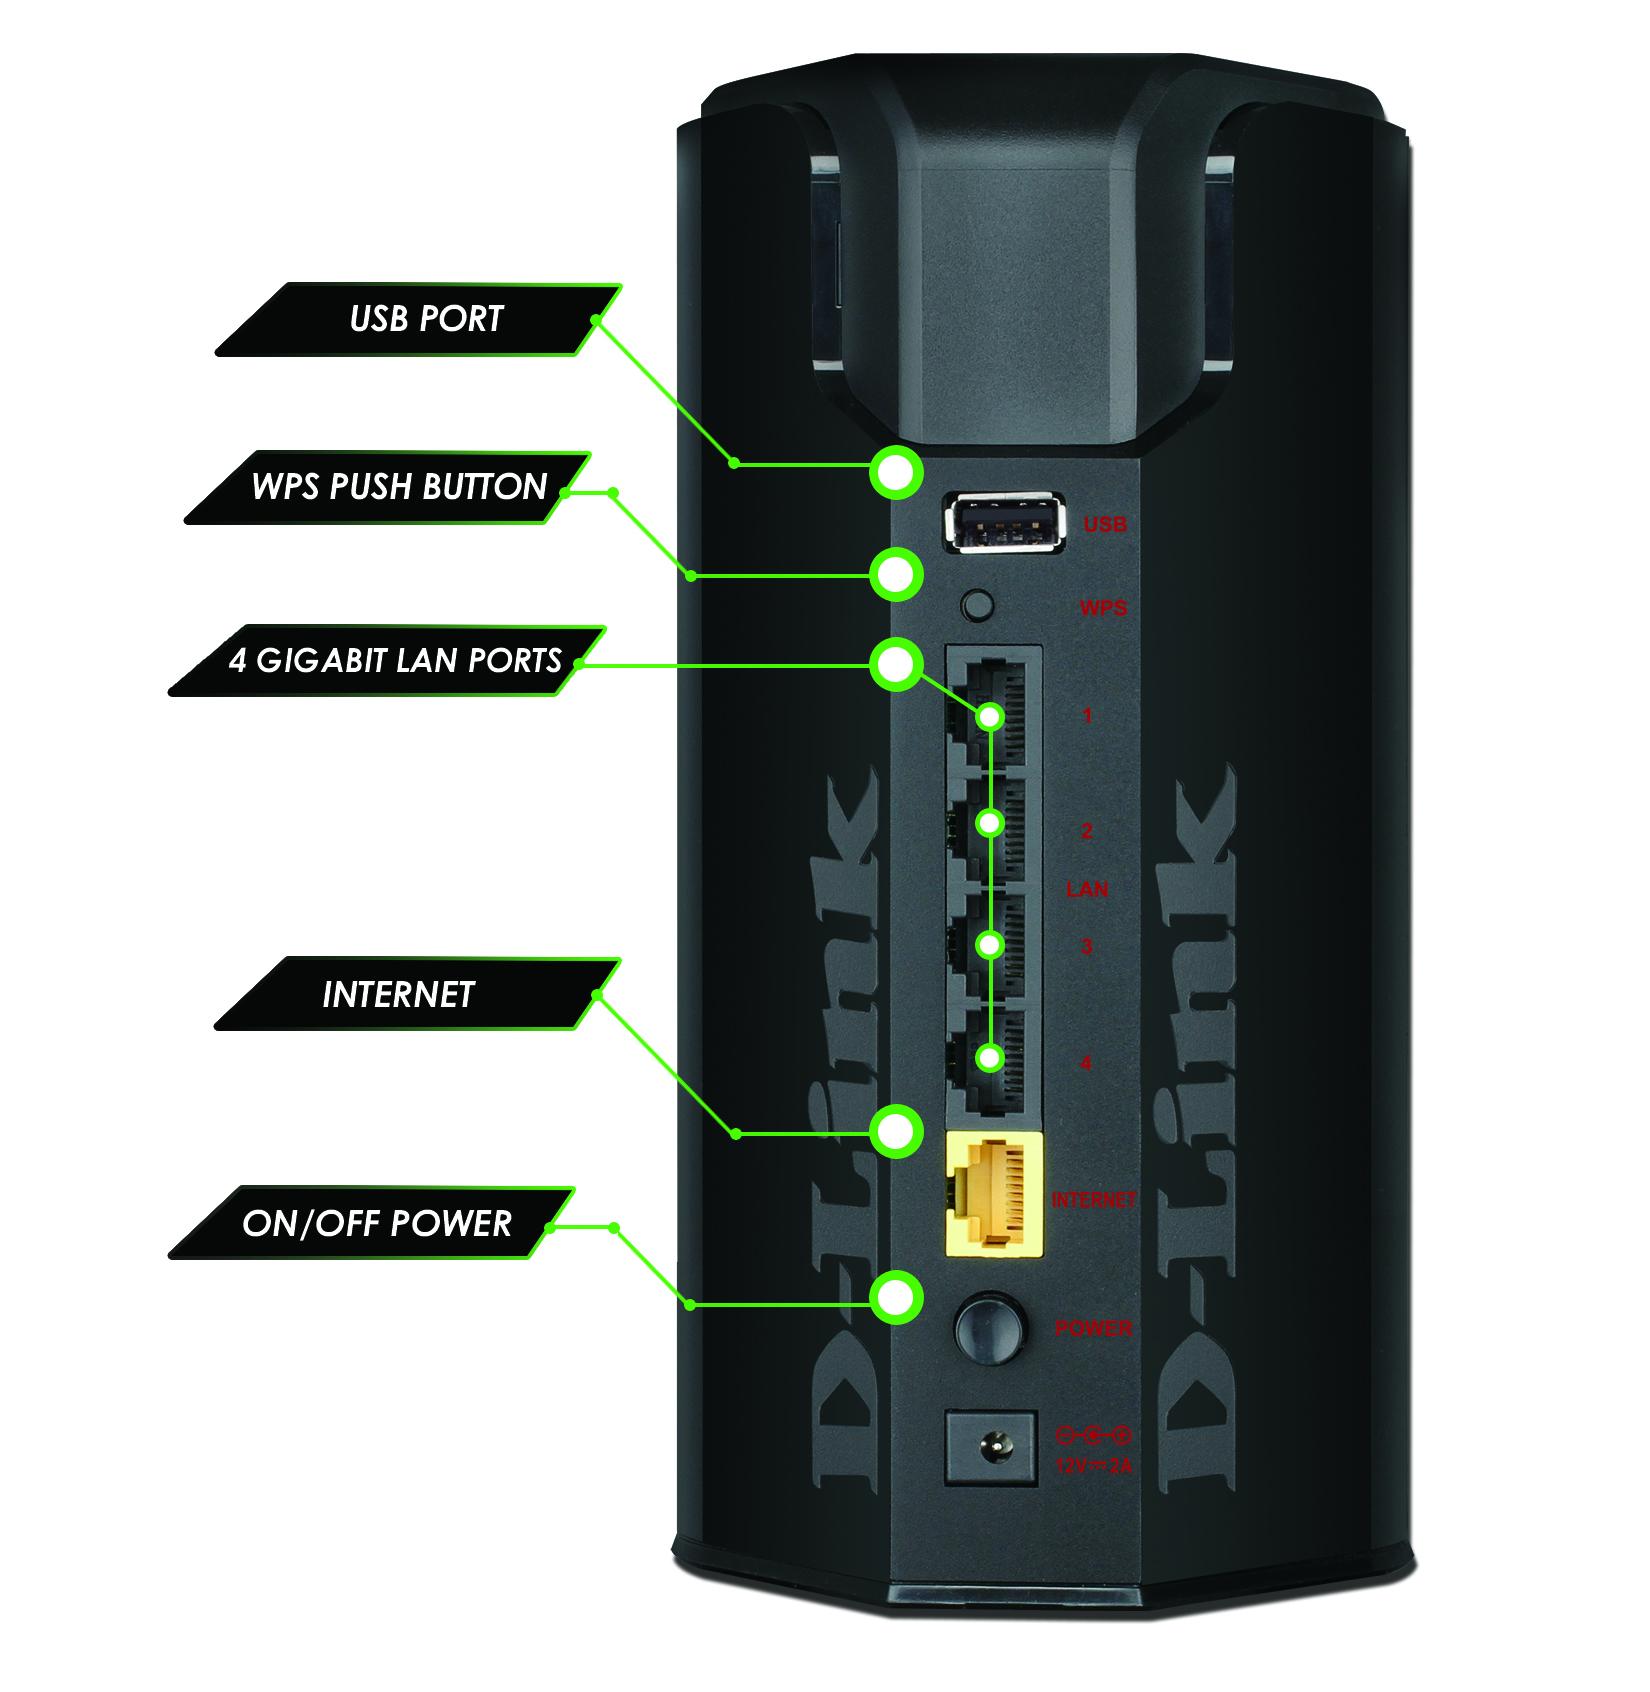 D Link Gaming Router Ac1300 Hardware Review Brutal Gamer